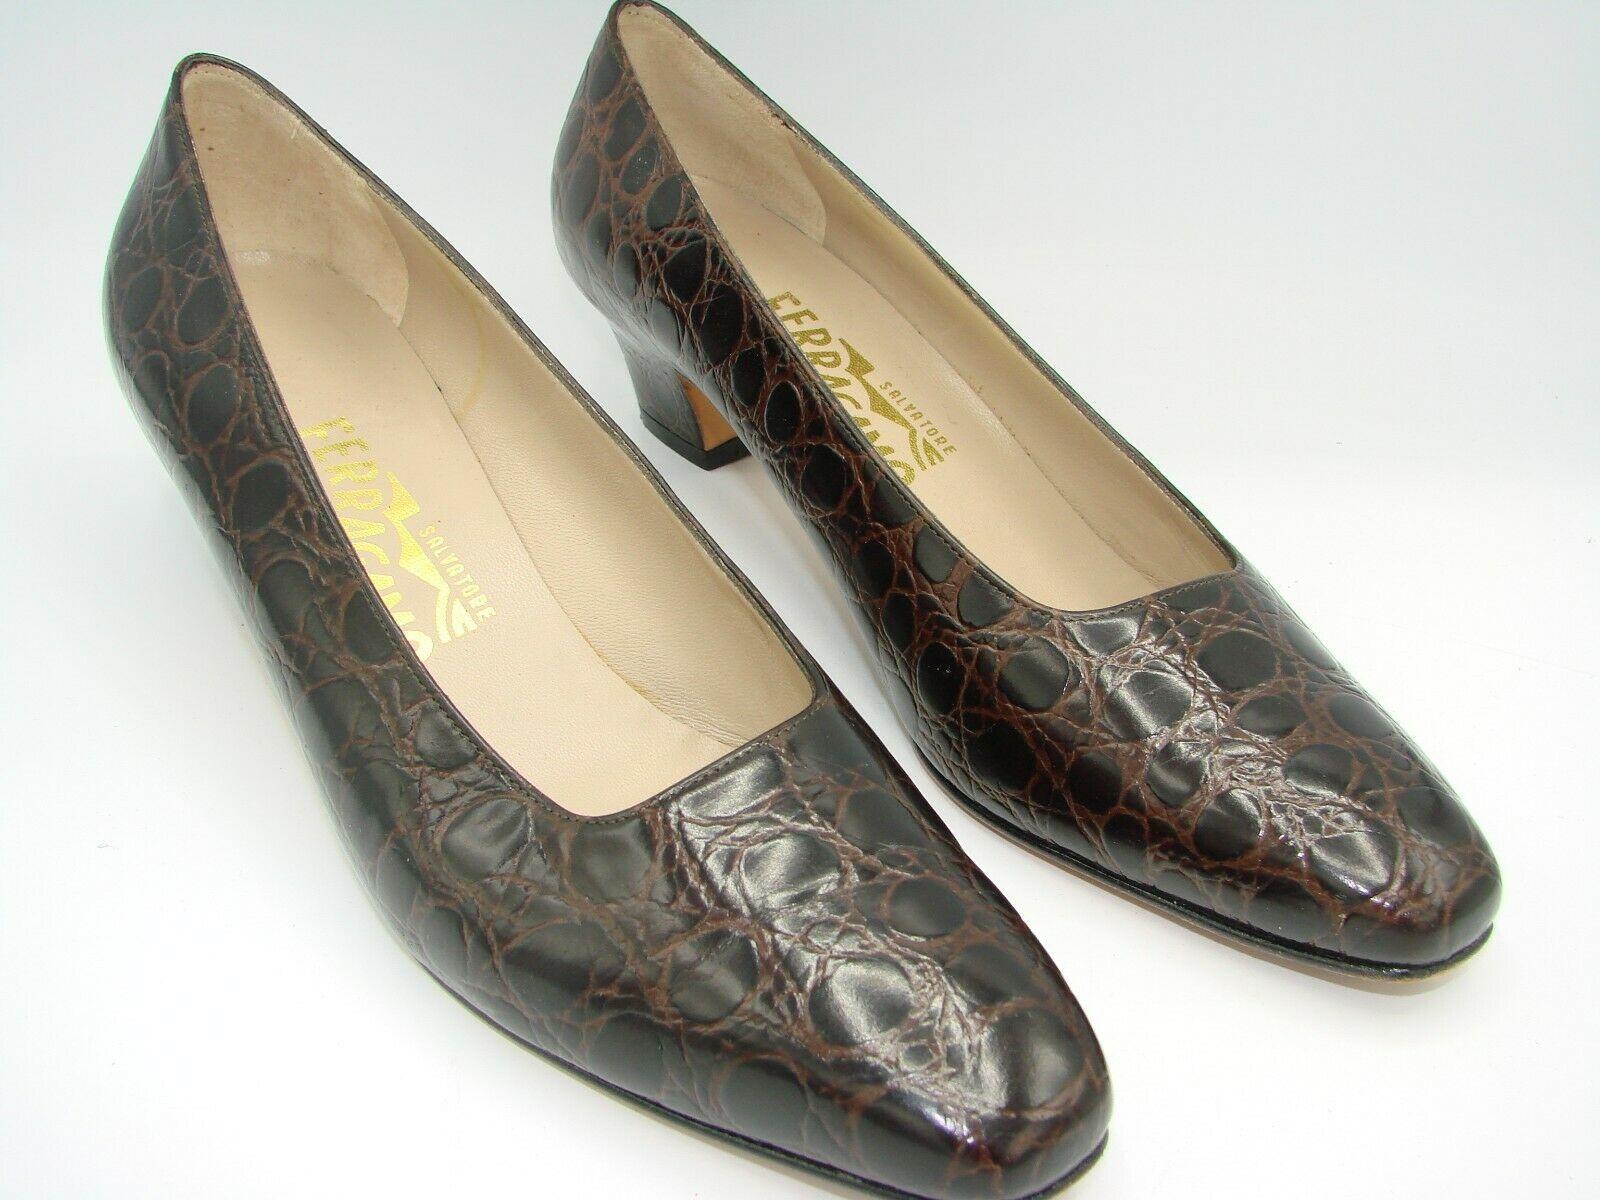 SALVATORE FERRAGAMO Women Shoes Polished Genuine Leather  8 1/2 AA 17666-149 image 4